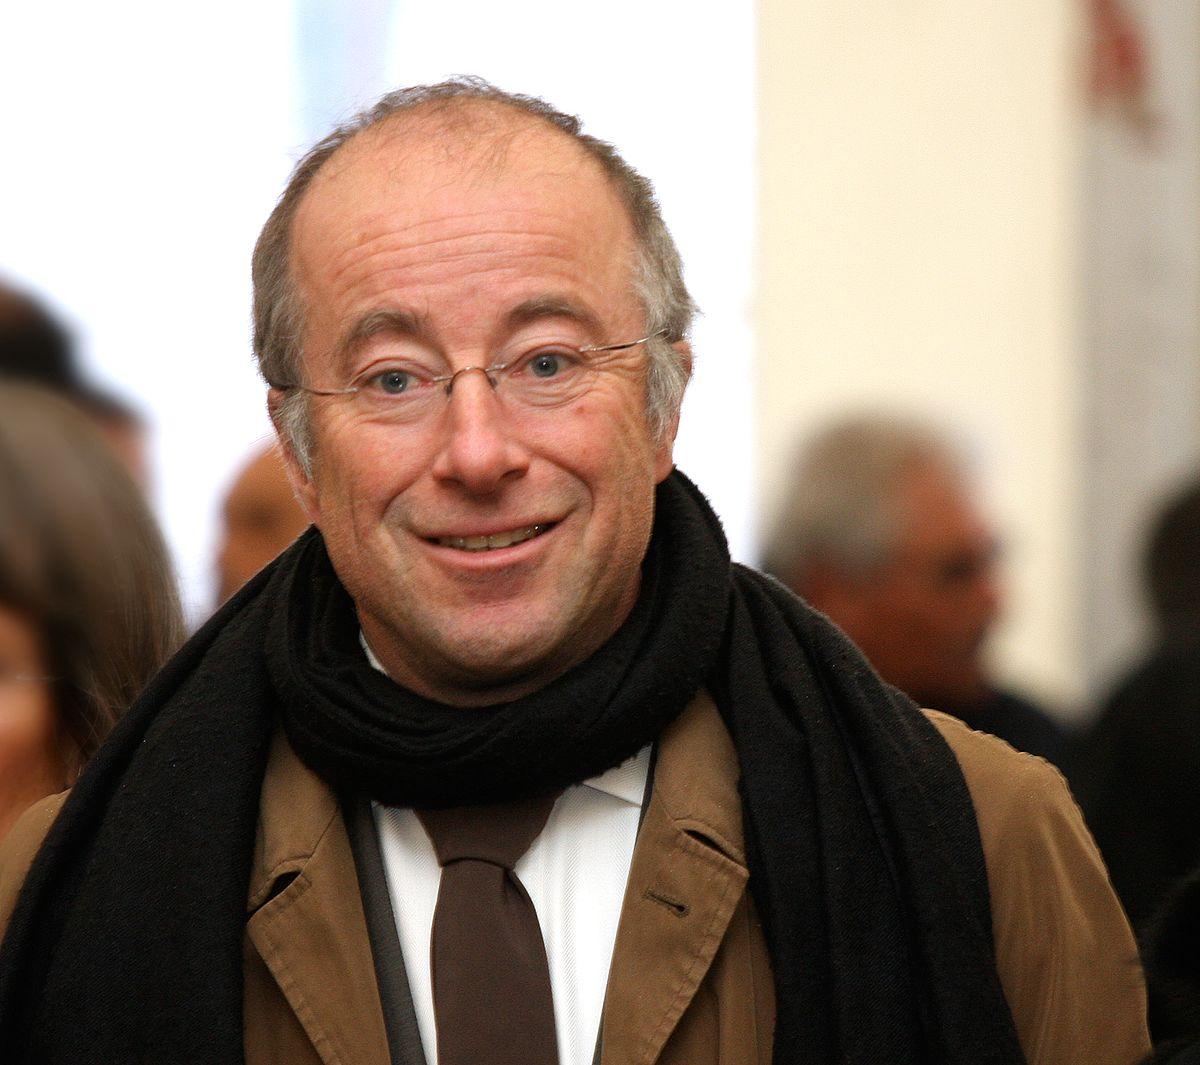 Architekt Köln paul böhm